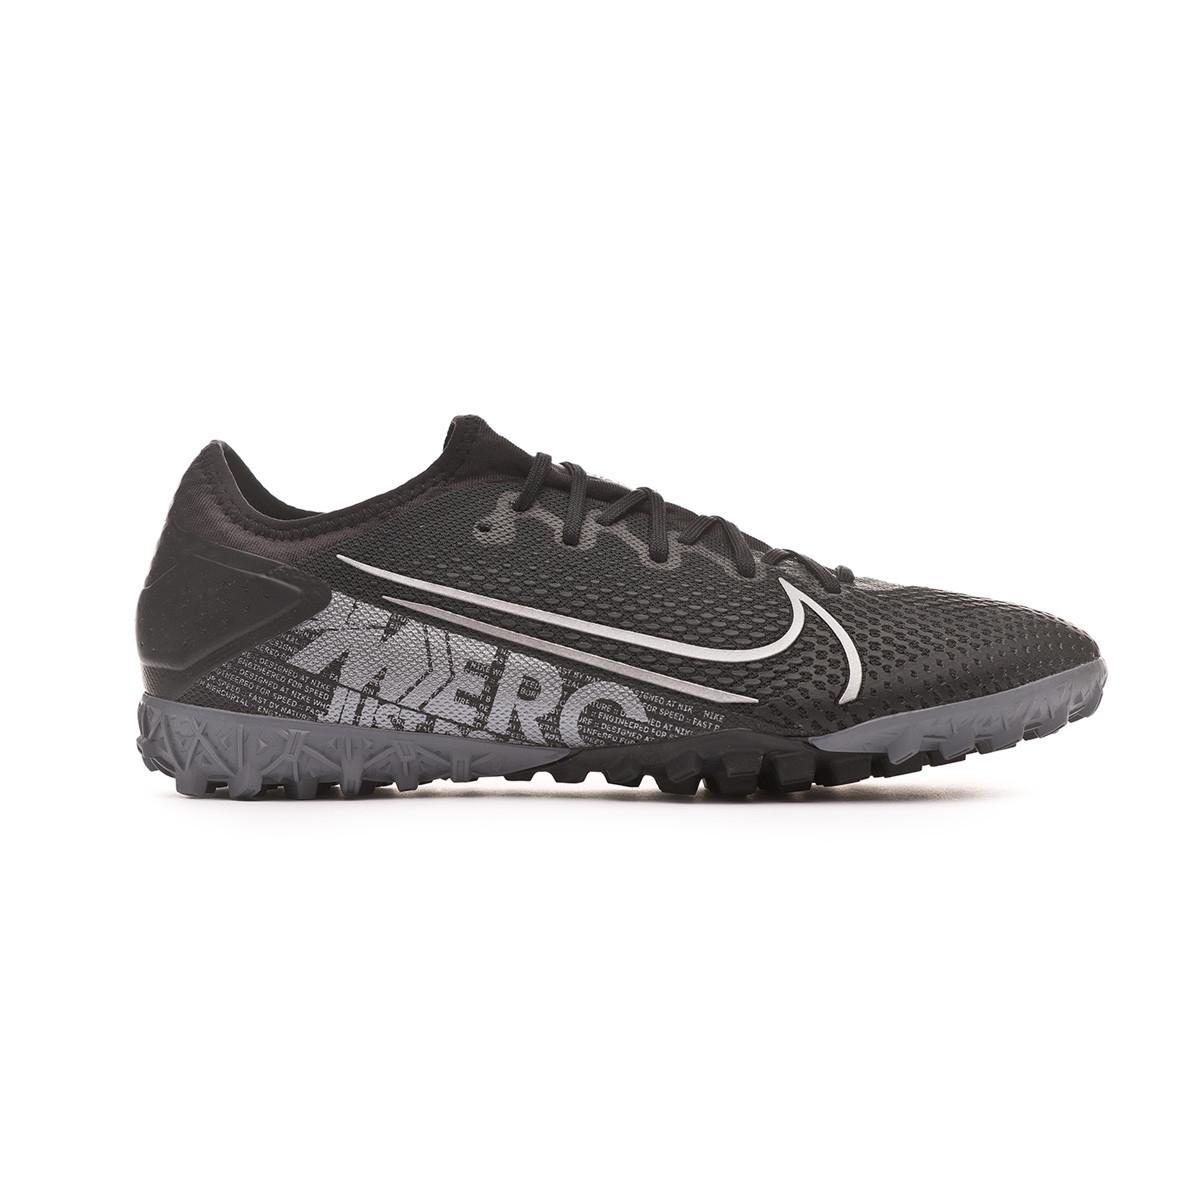 Sapatilhas Nike Mercurial Vapor XIII Pro Turf Black Metallic